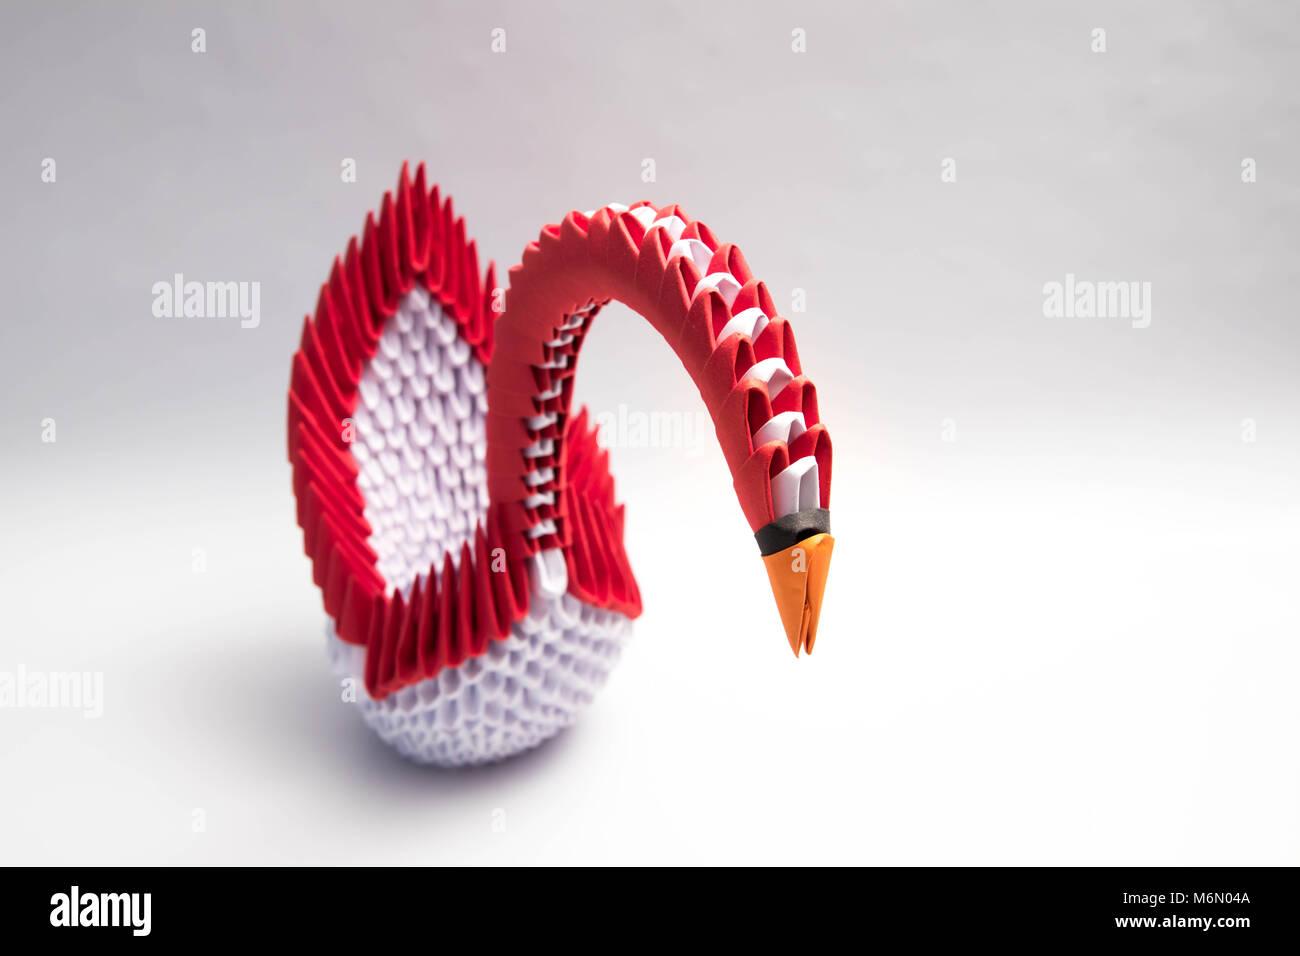 aniviya Handmade 3D Origami swan: Blue: Amazon.in: Home & Kitchen | 956x1300